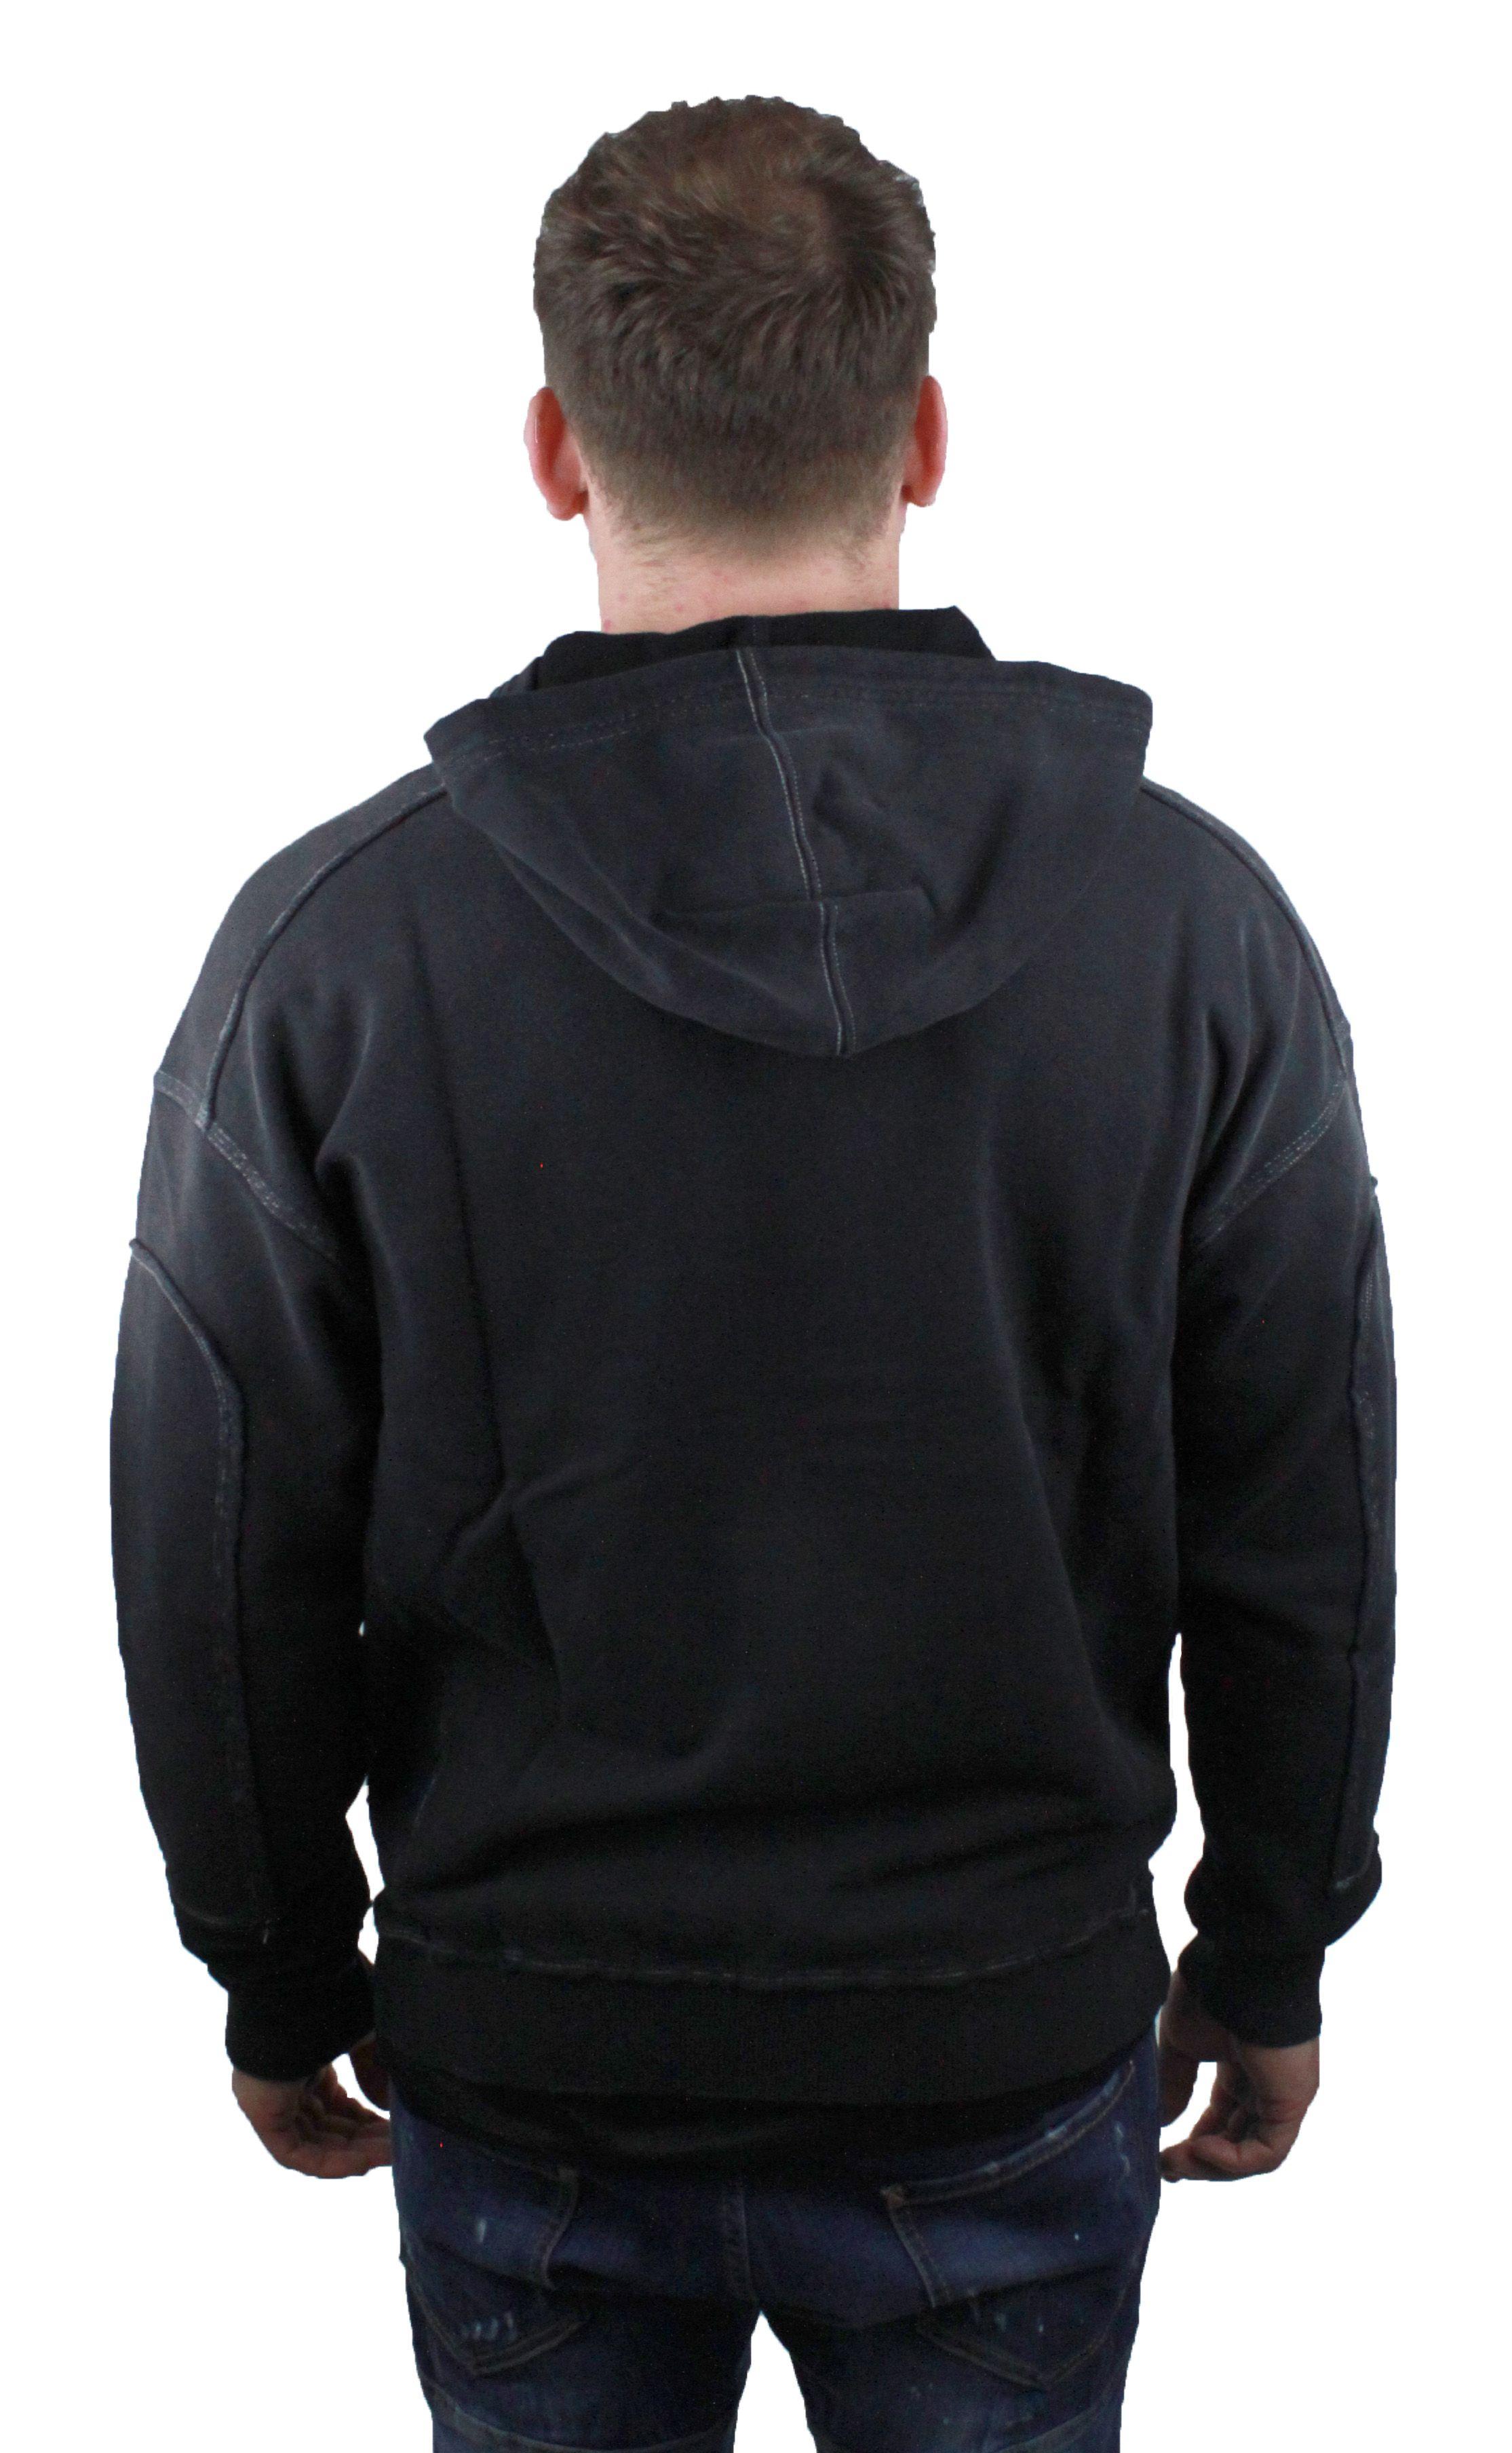 Givenchy BM708P3003 001 Mens Black Hoodie